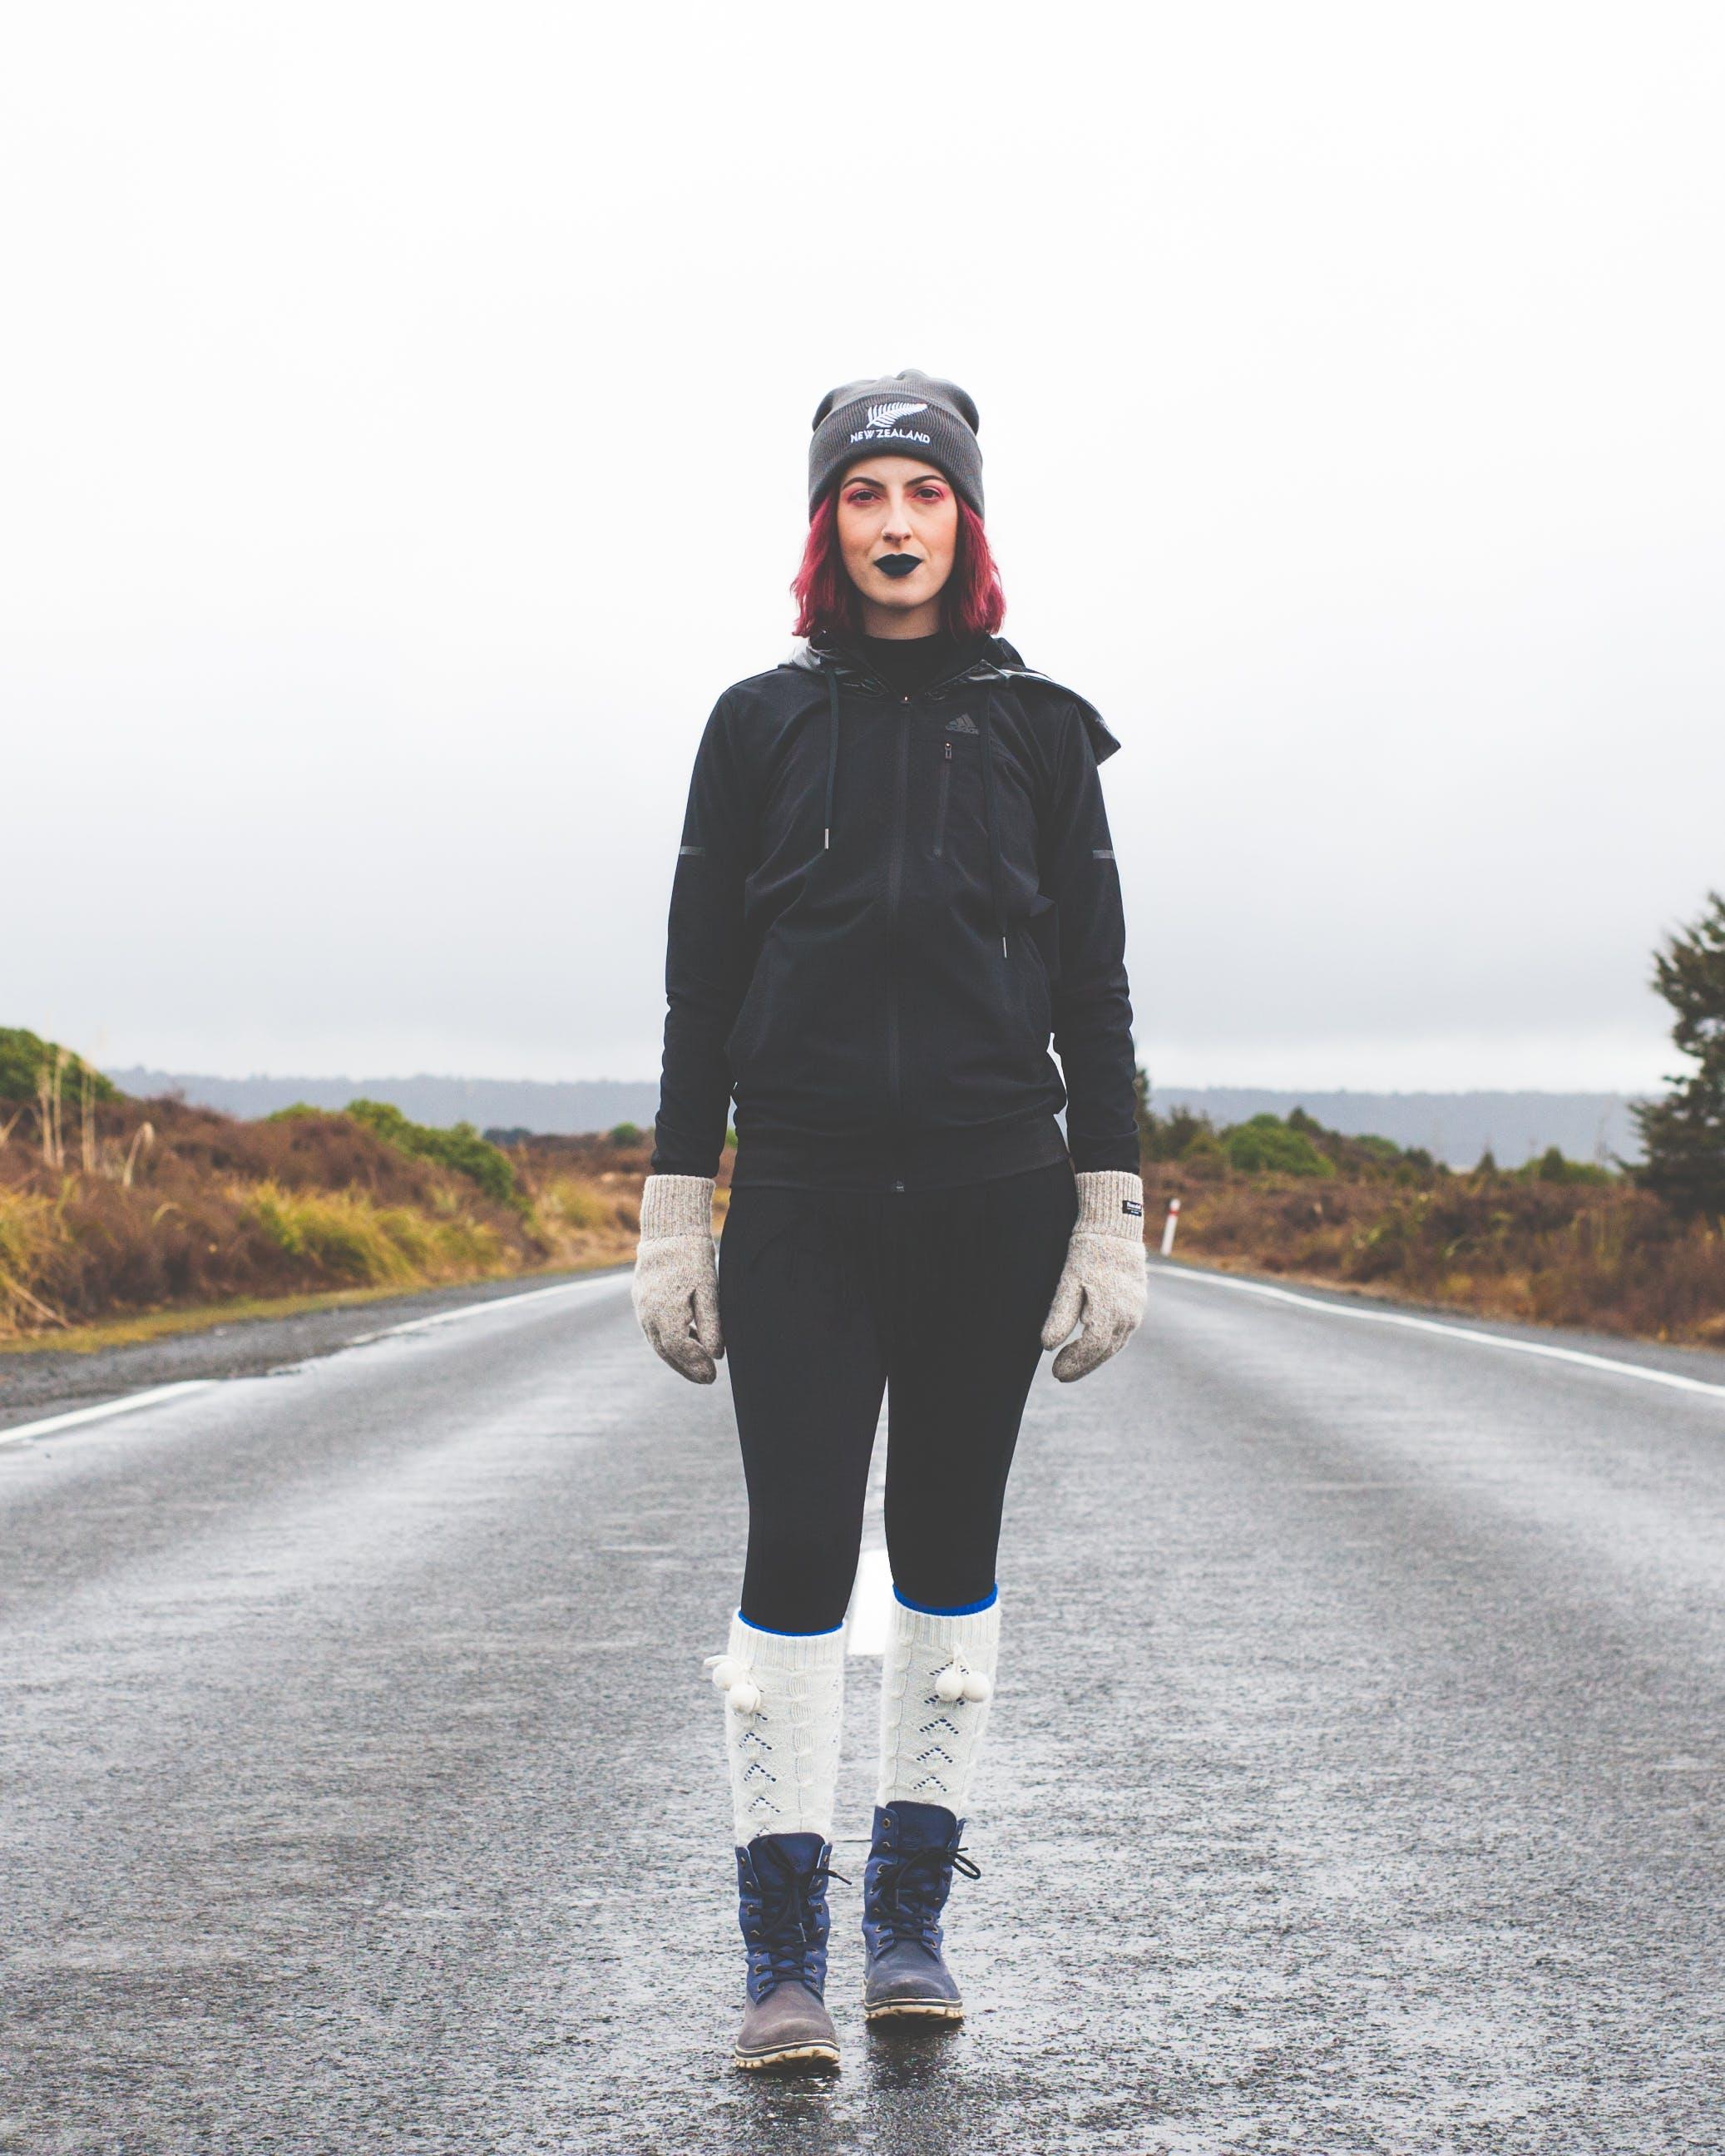 Kostenloses Stock Foto zu asphalt, fashion, frau, person